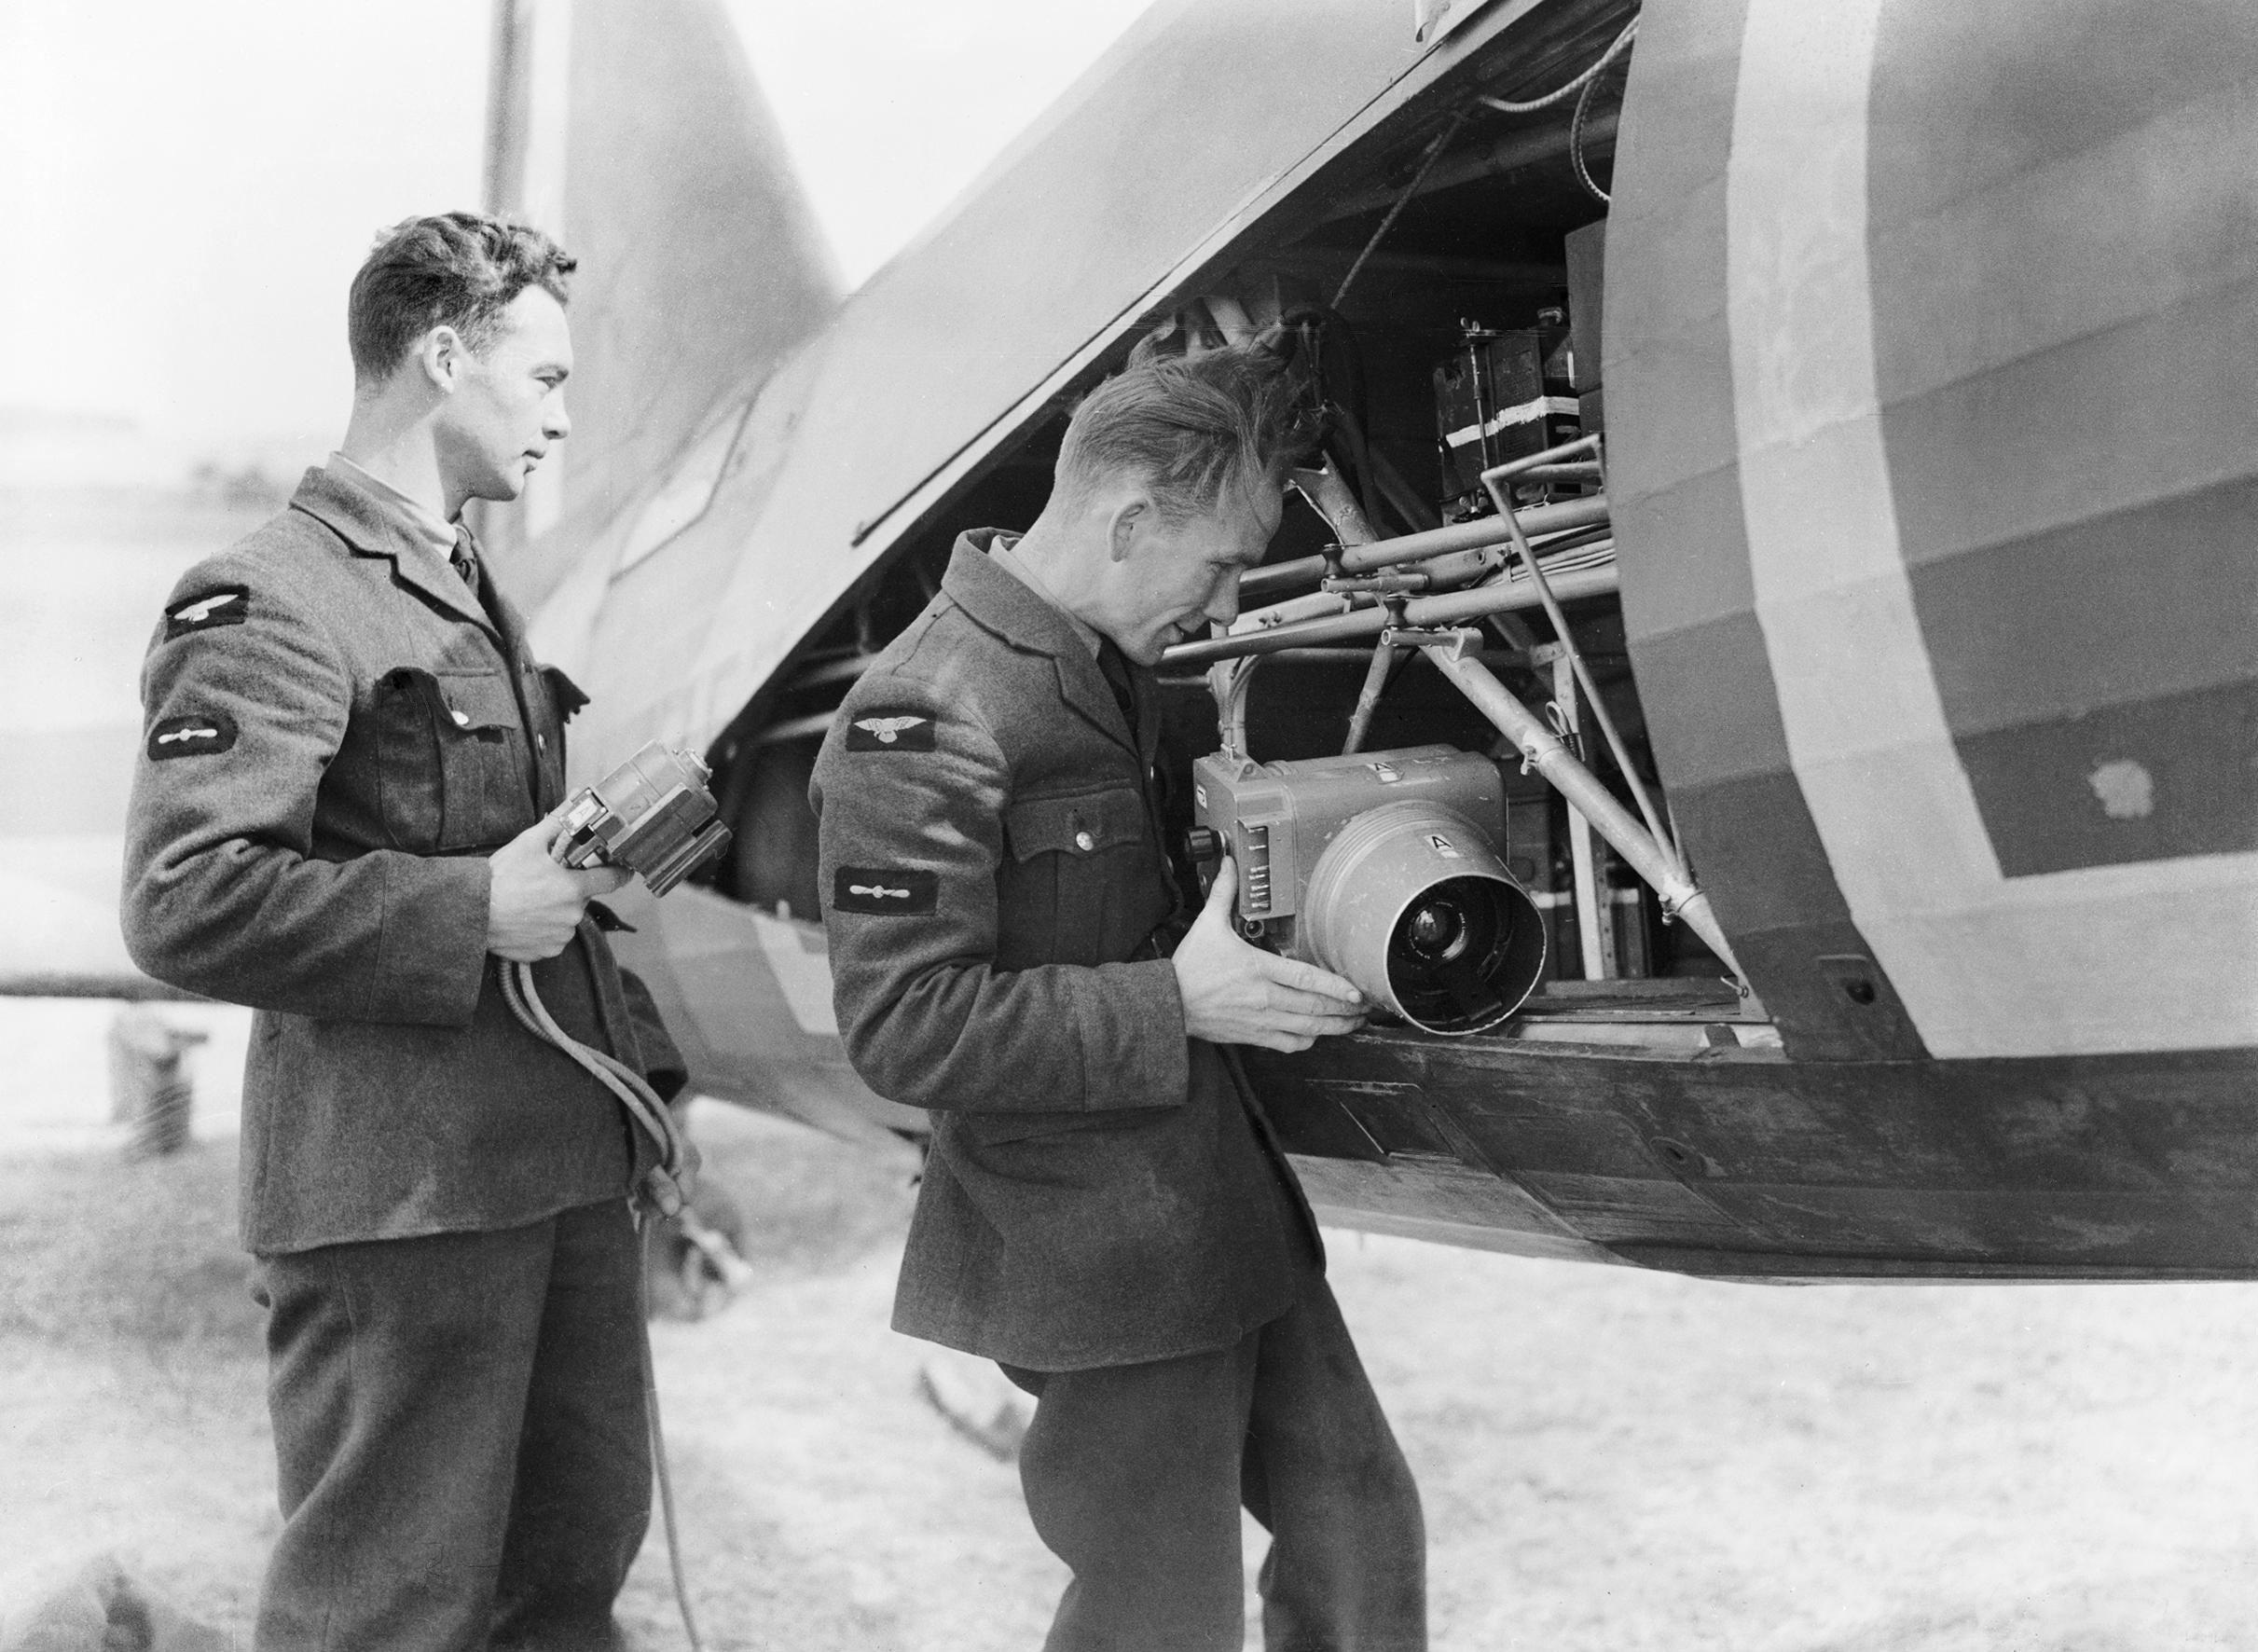 No. 225 Squadron RAF